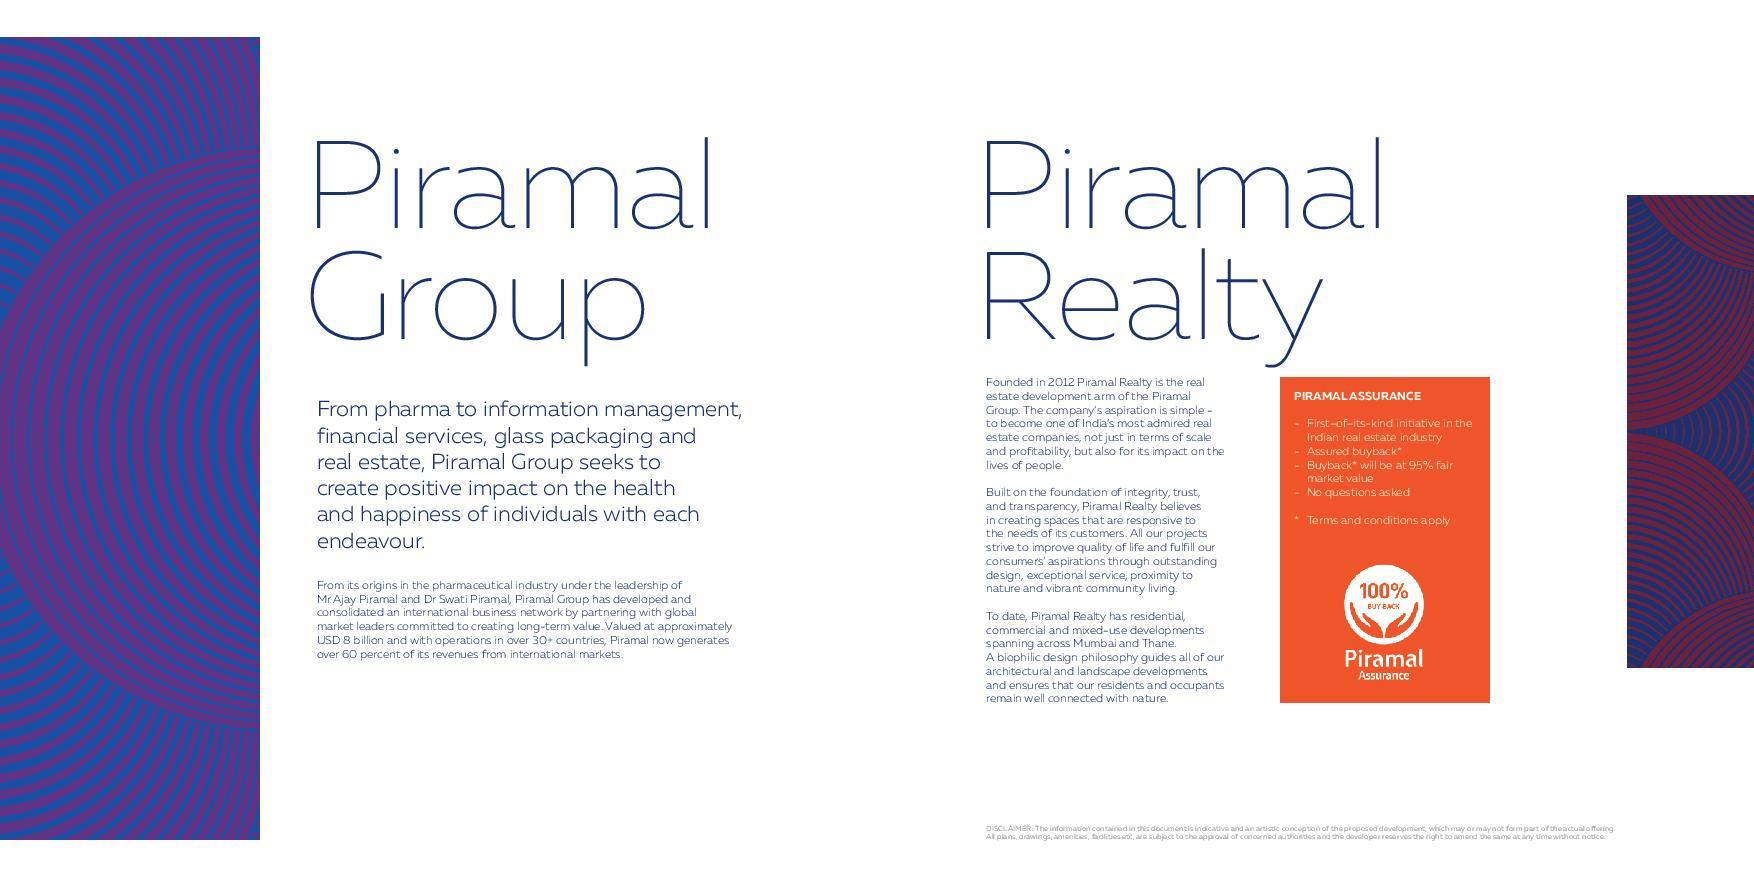 Piramal group piramal realty Revanta